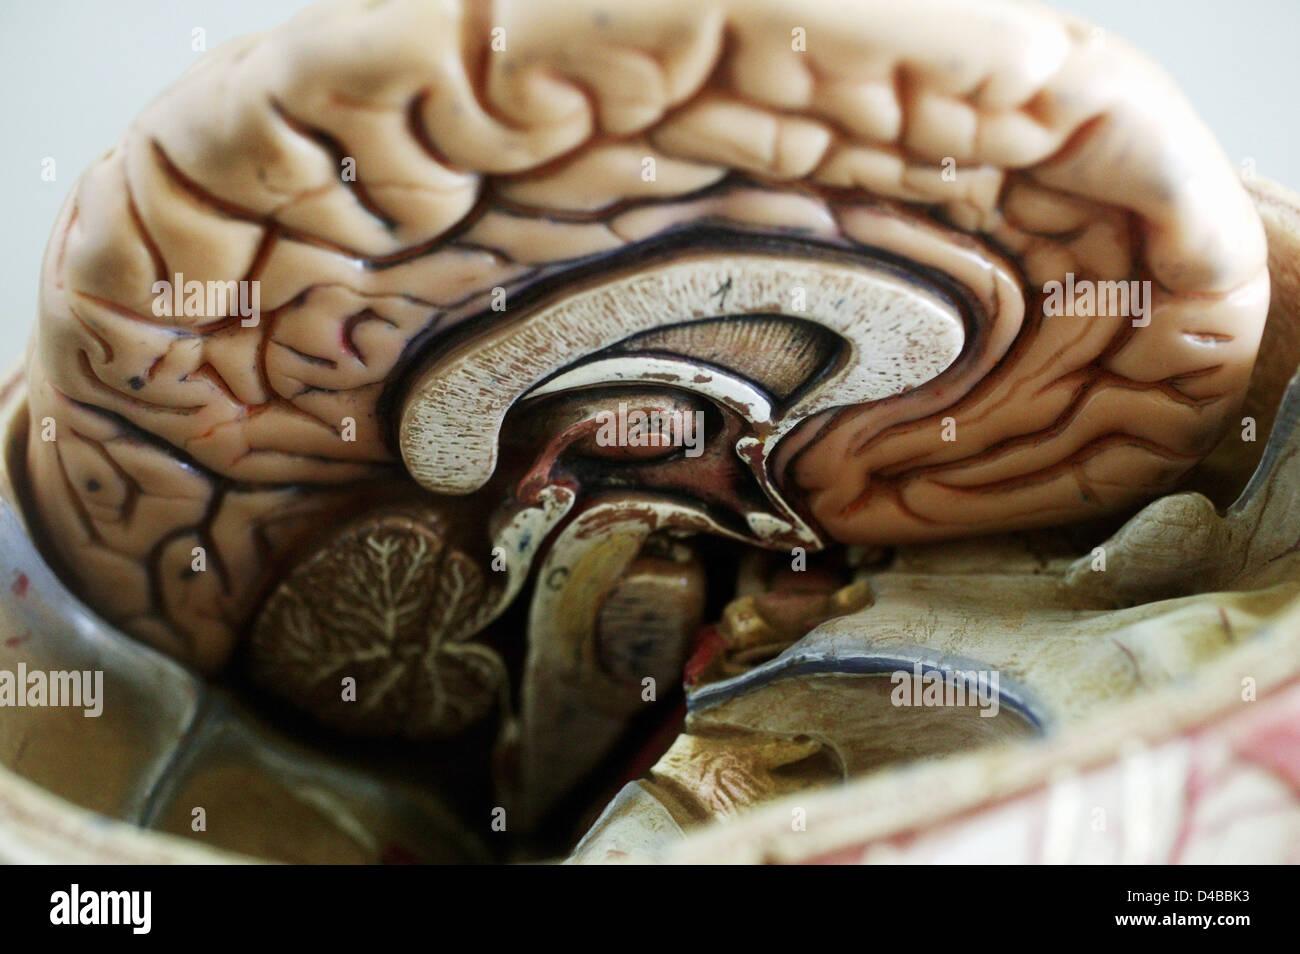 Brain Model Top View Stock Photos & Brain Model Top View Stock ...